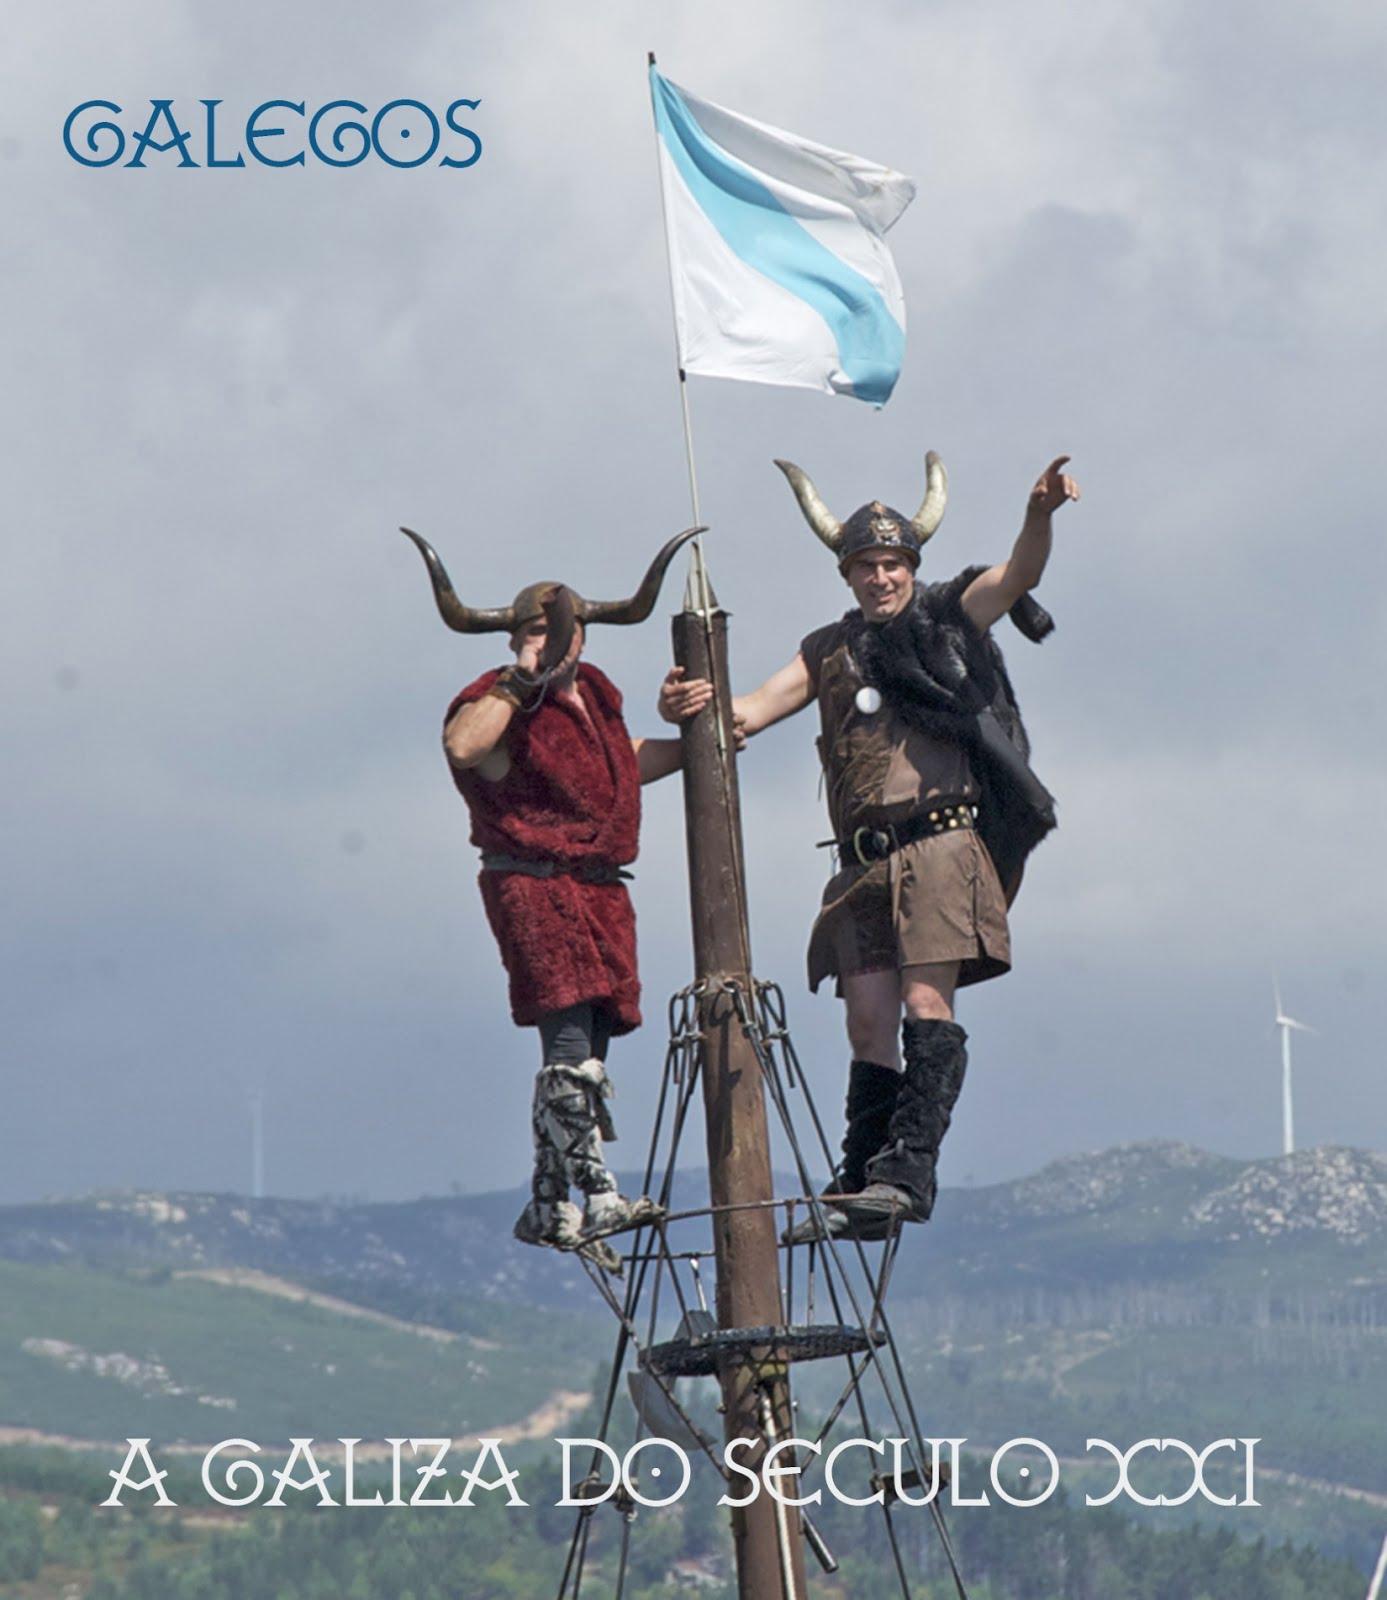 GALEGOS. A Galiza do século XXI